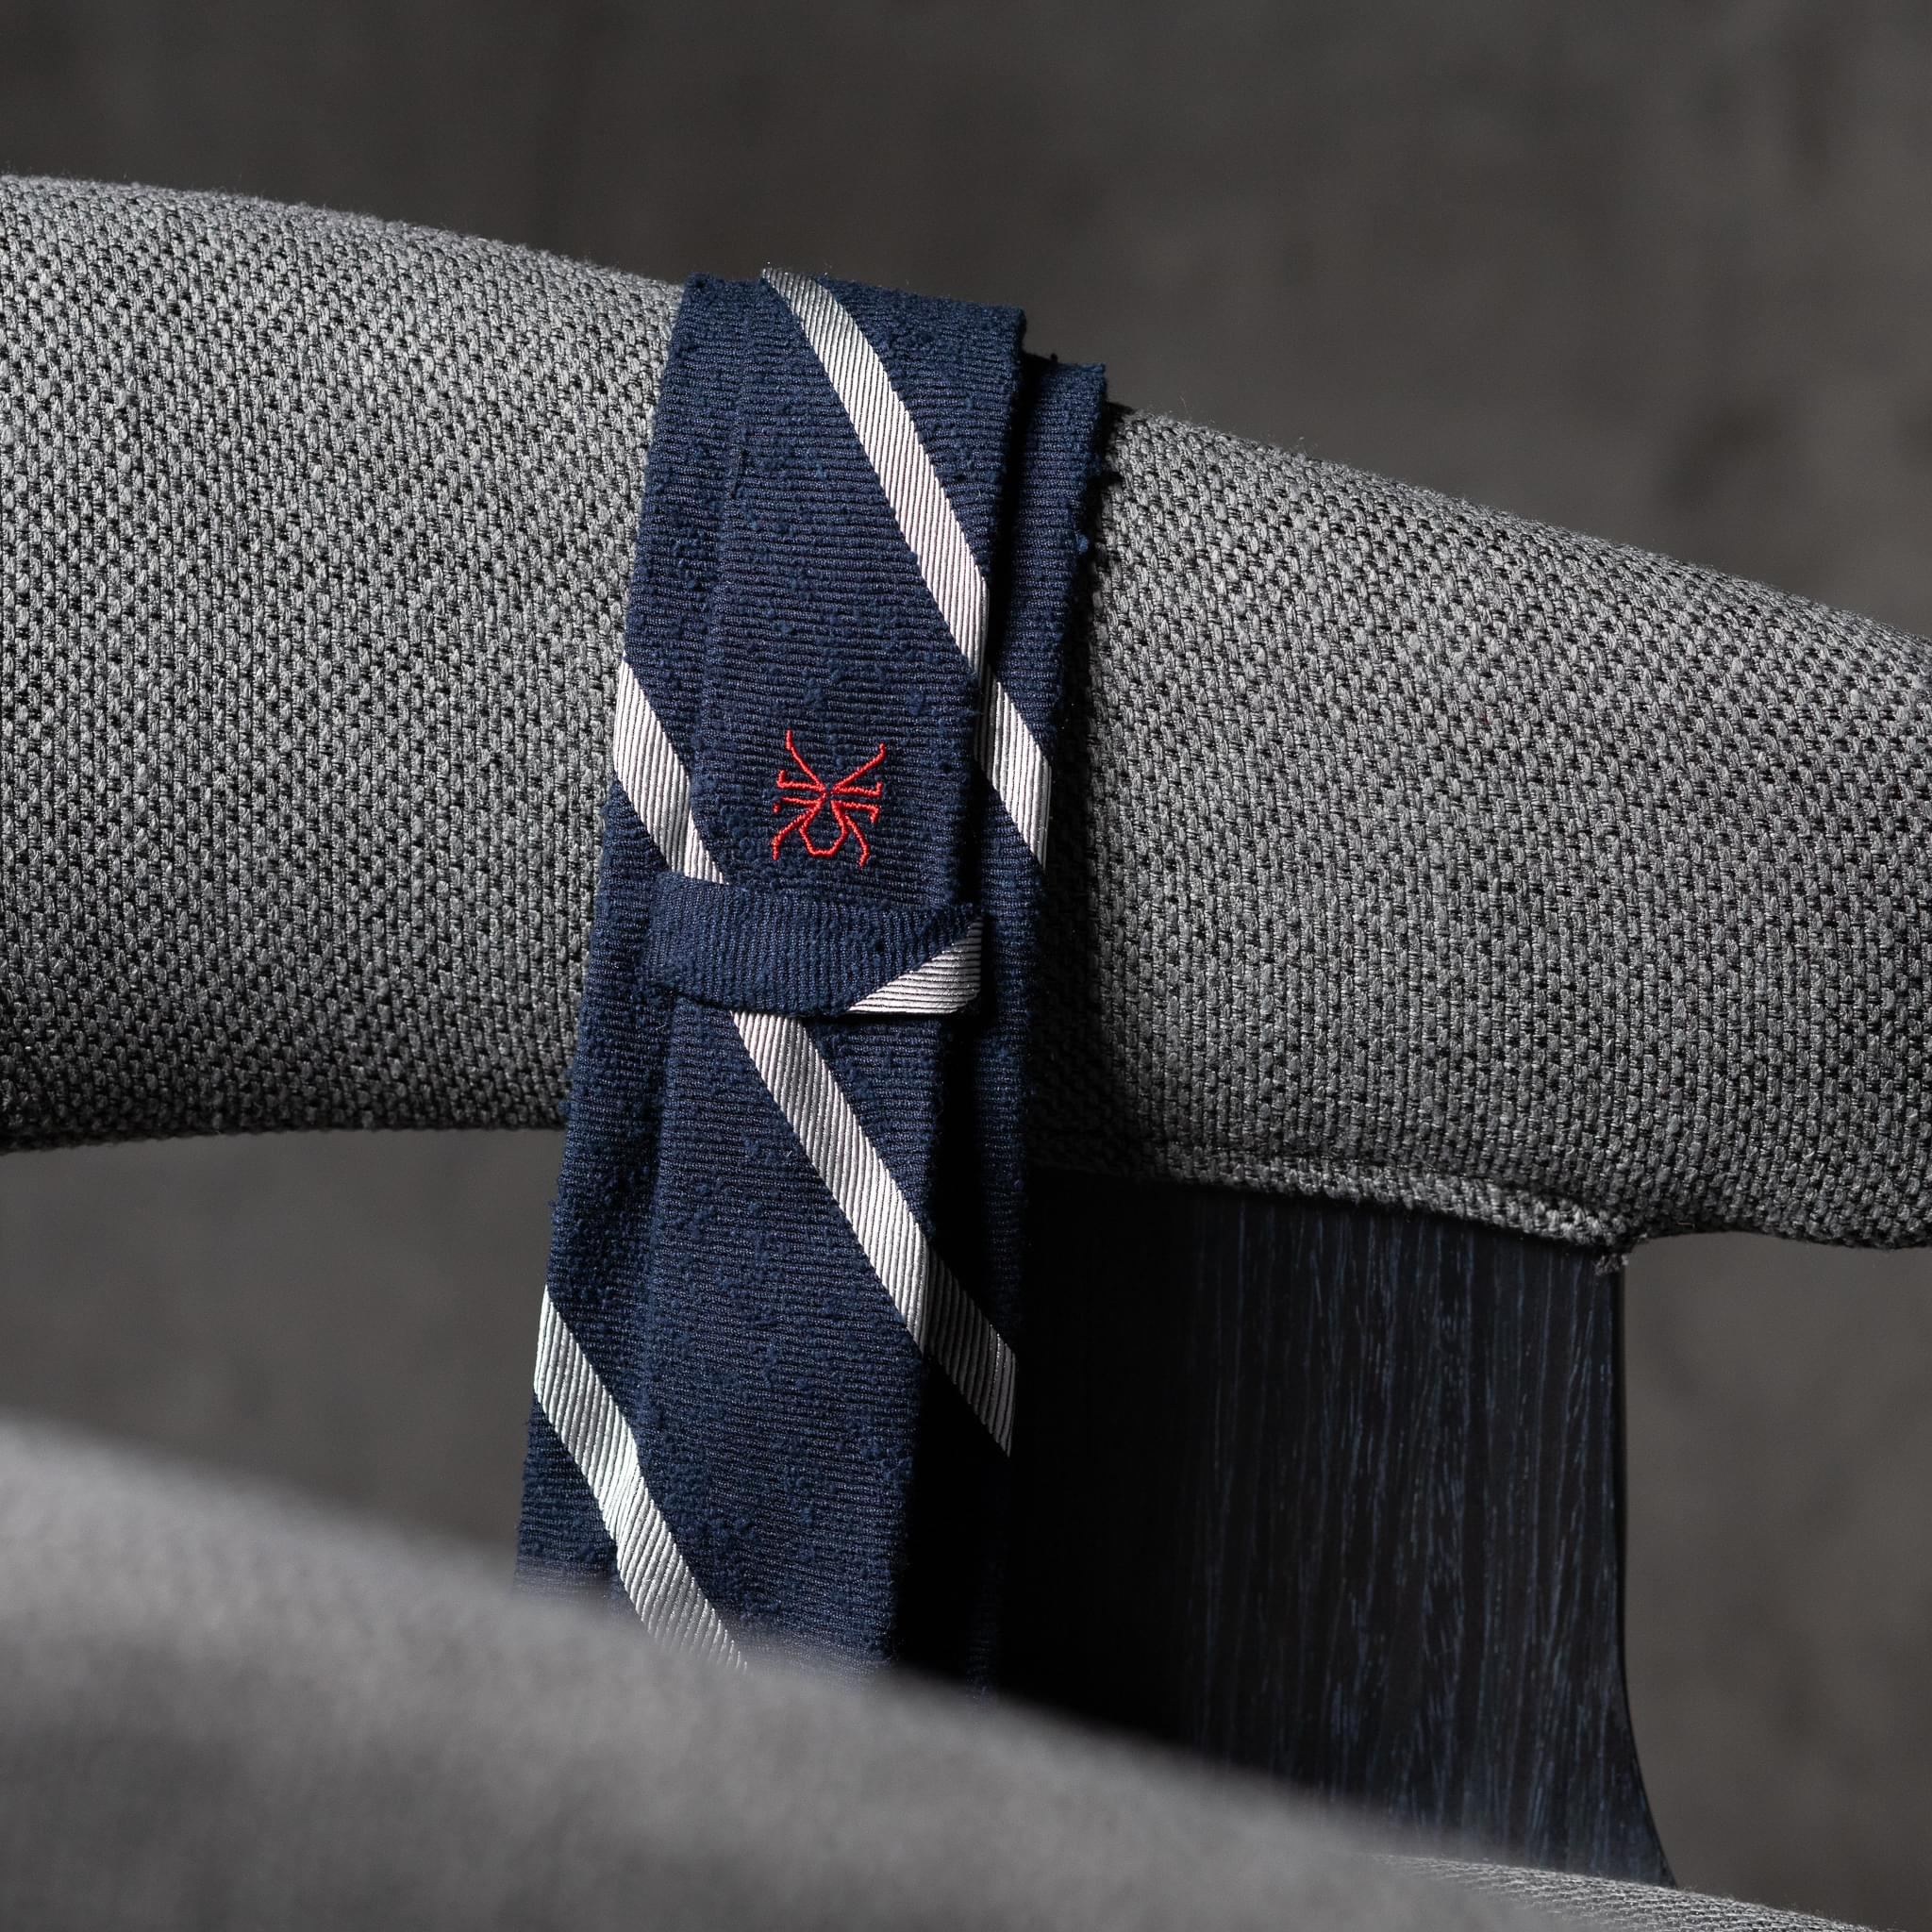 SHANTUNG-0361-Tie-Initials-Corbata-Iniciales-The-Seelk-3